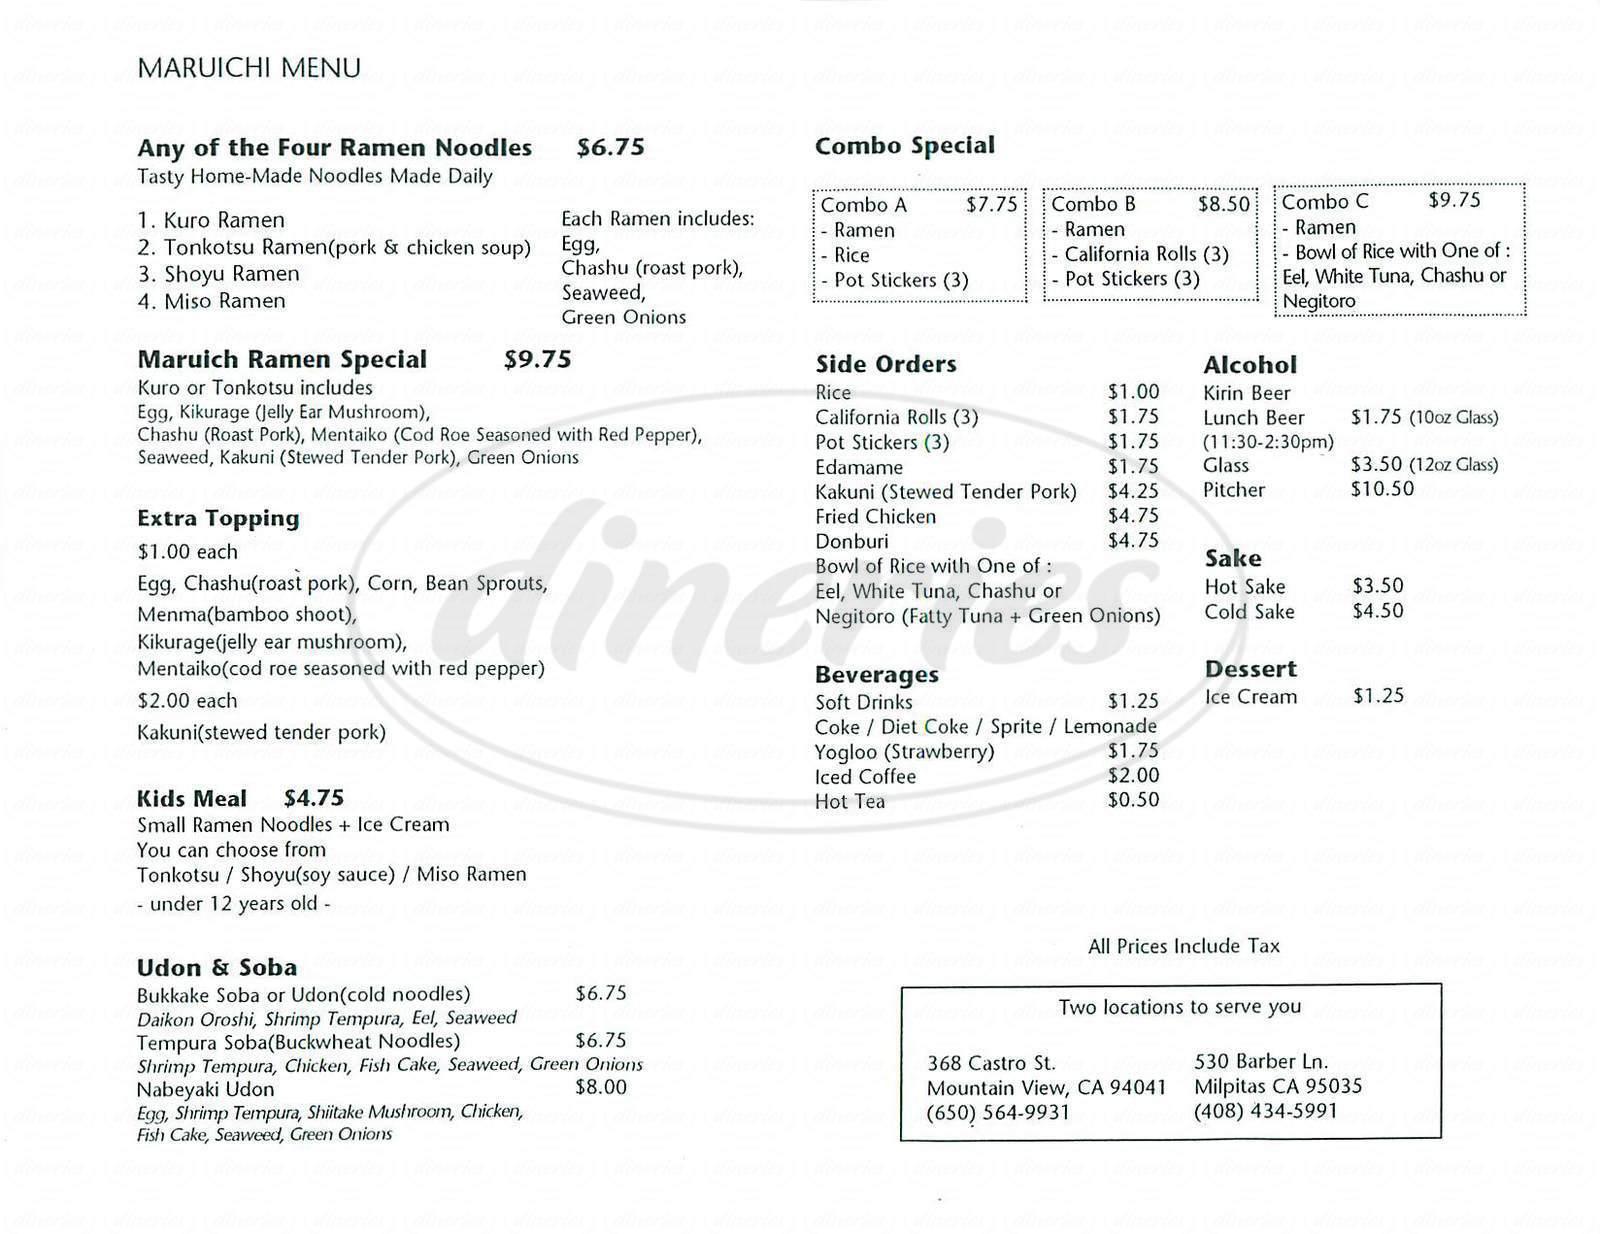 menu for Maruichi Restaurant